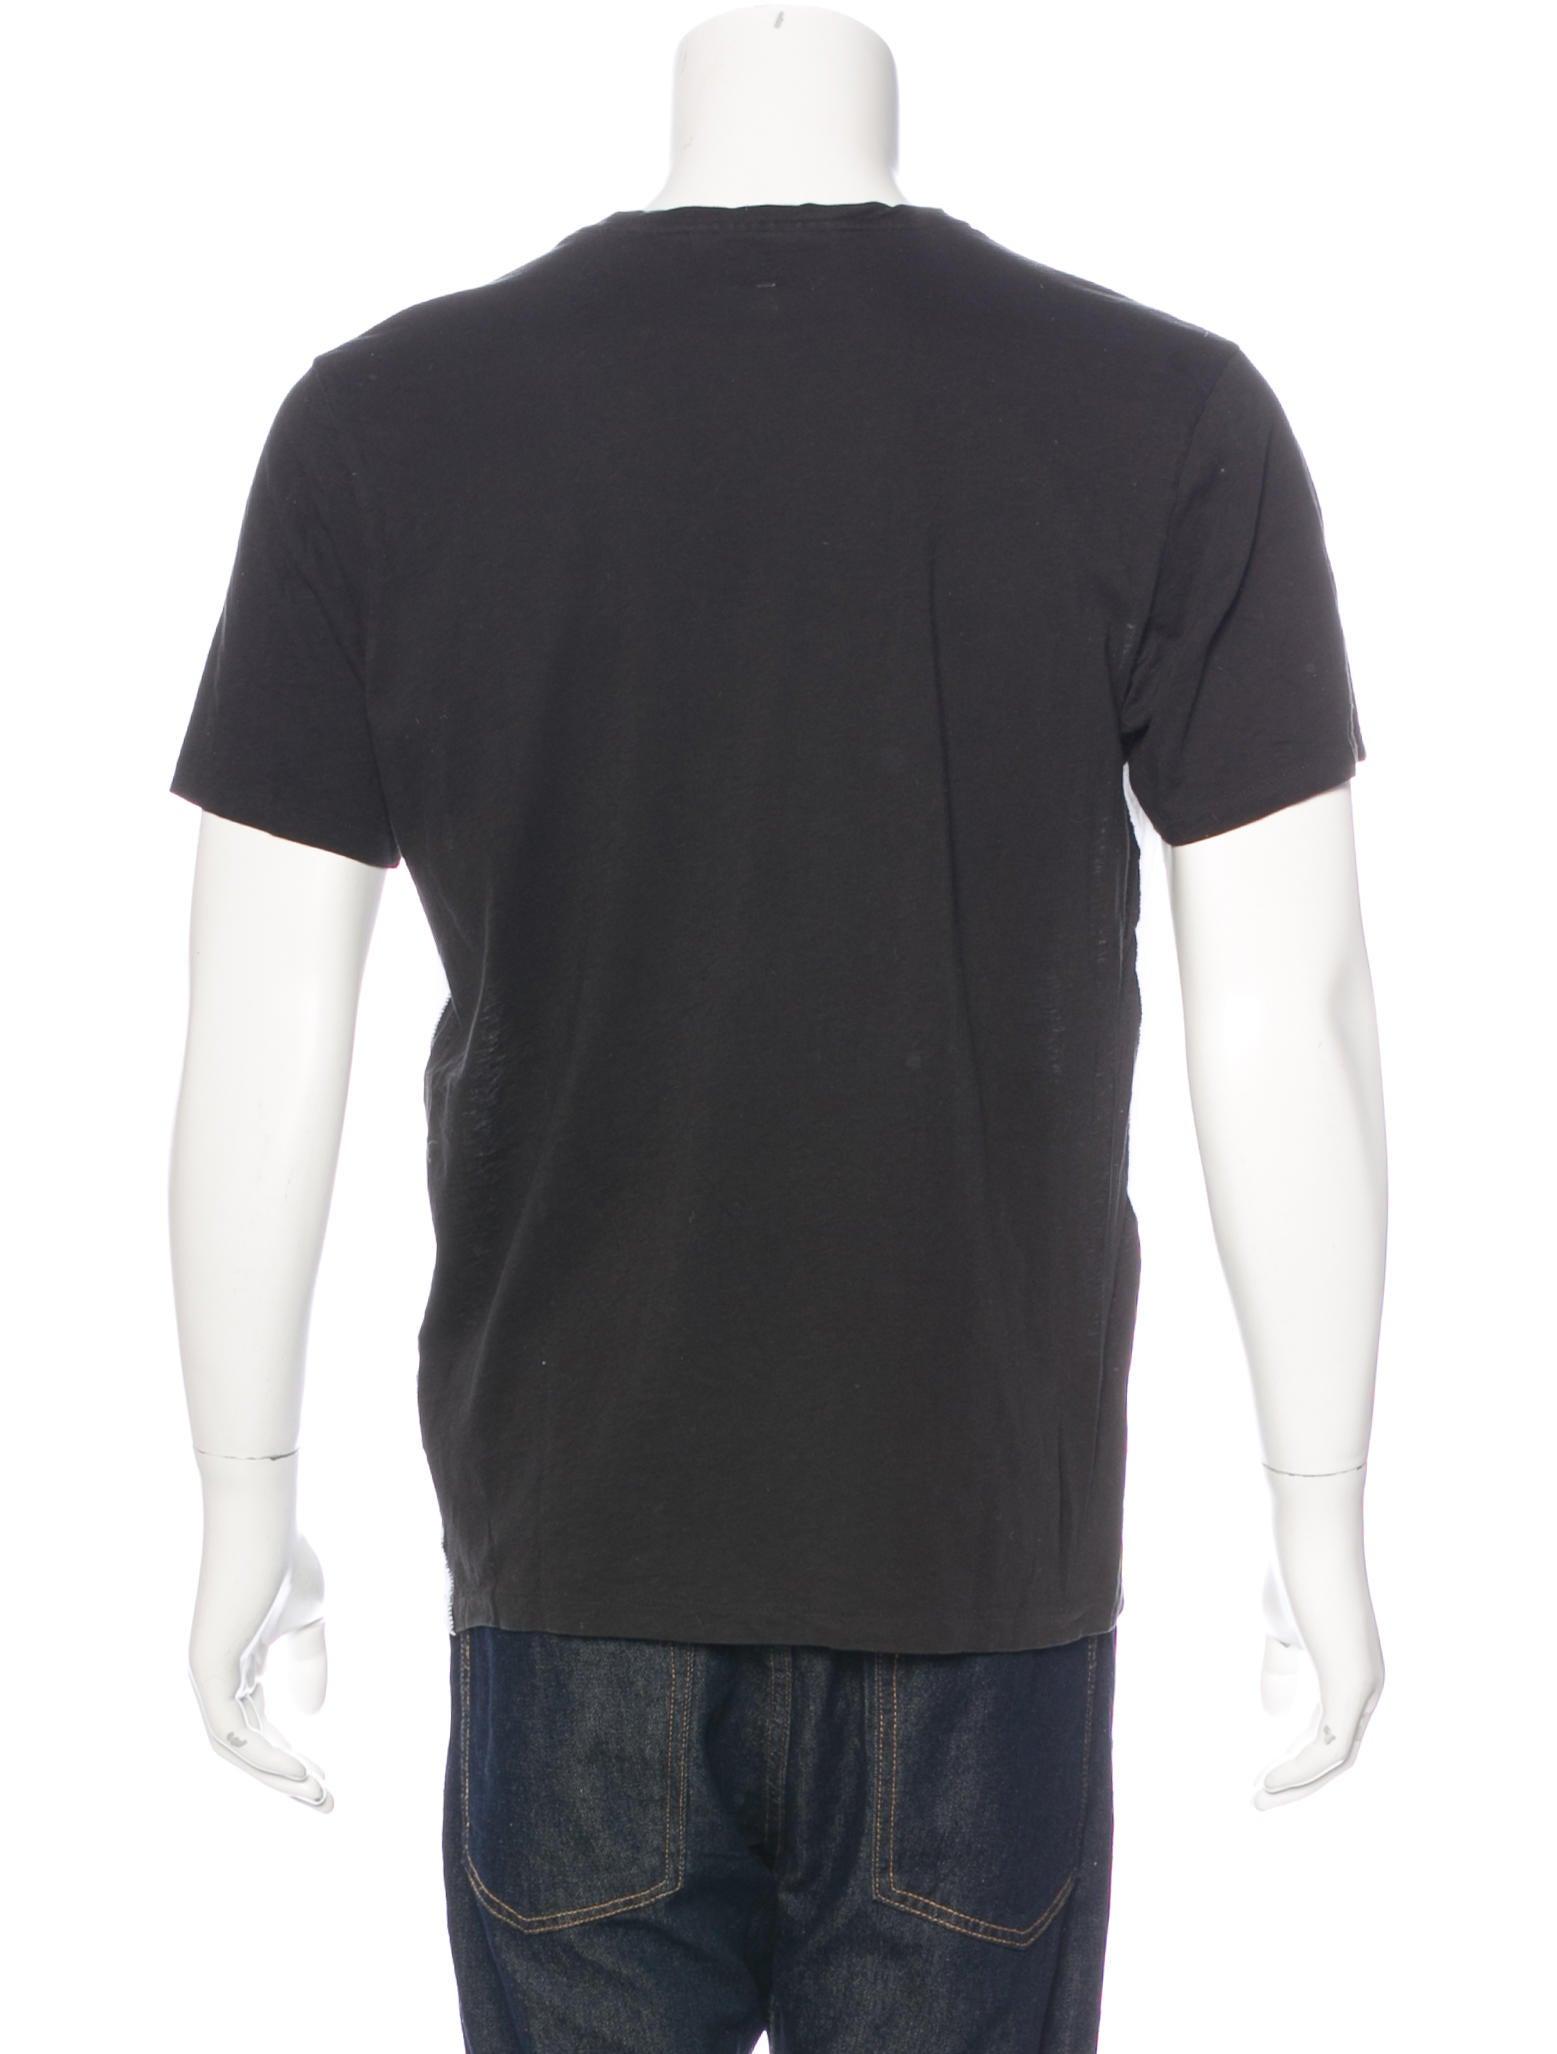 Rag bone colorblock woven t shirt clothing for Rag and bone mens shirts sale